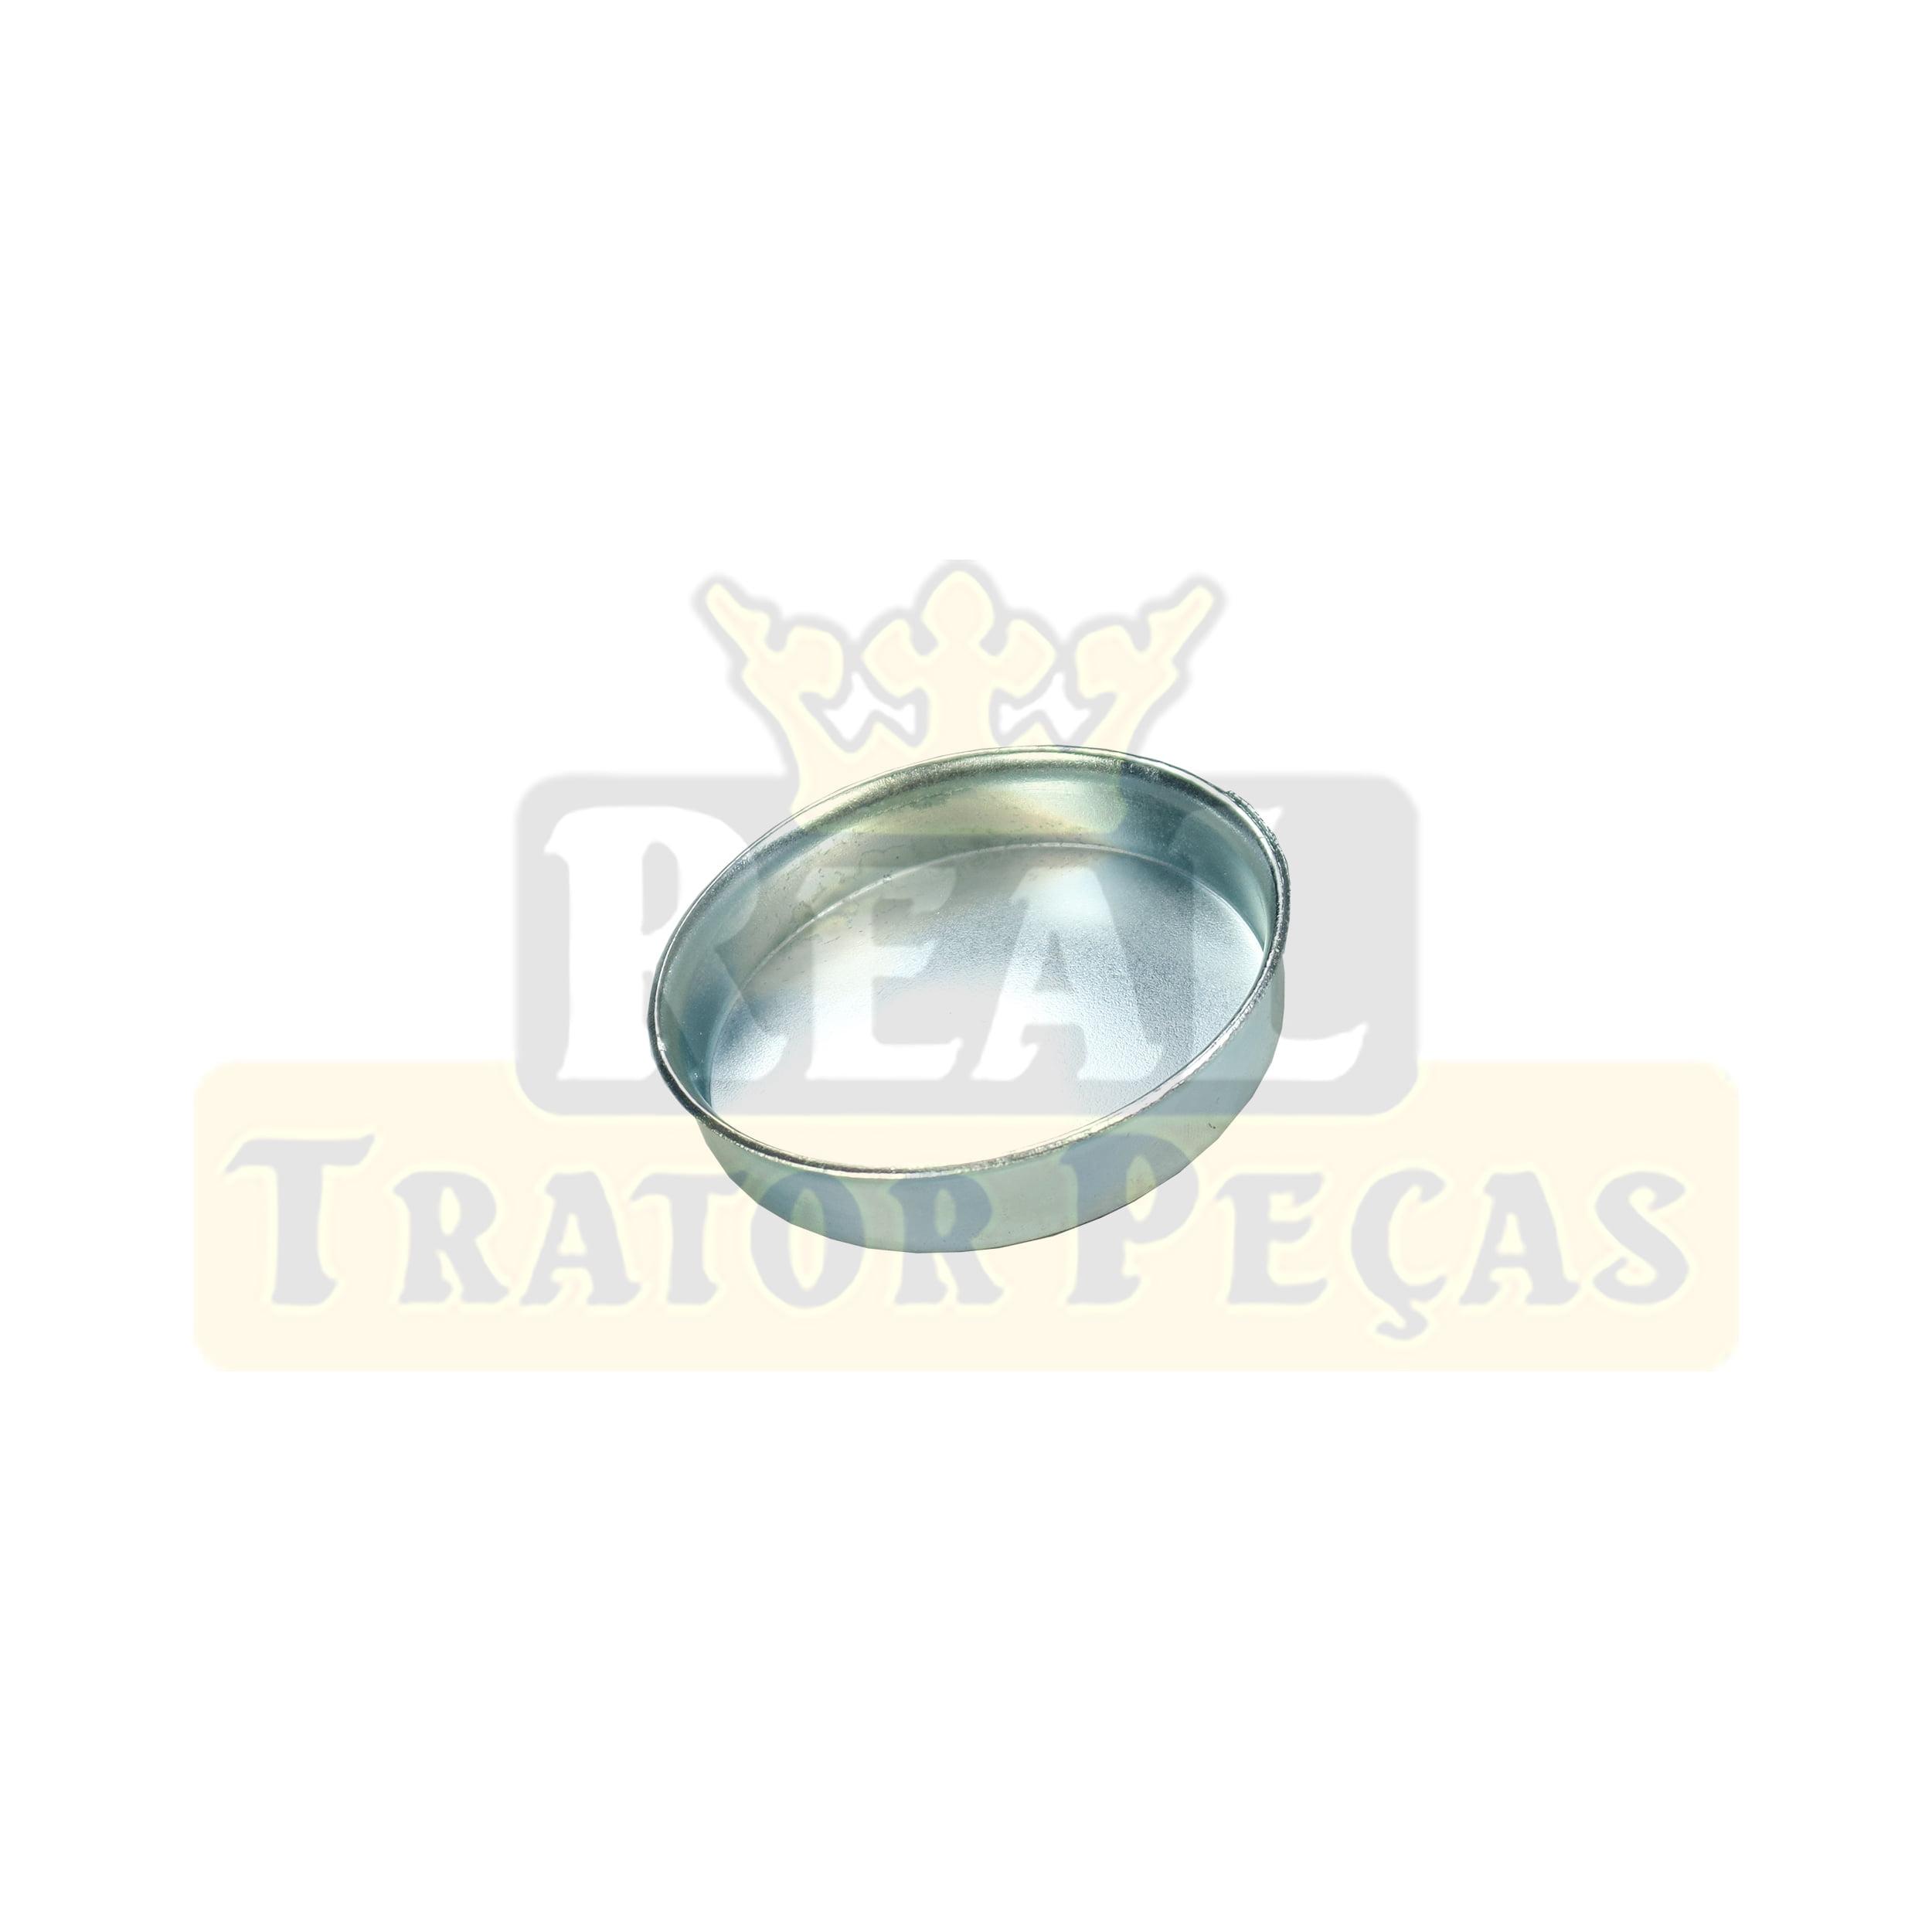 TAMPA CARCAÇA TRAÇÃO ZF 345/350 - MASSEY FERGUSON 290 A 299/610 A 640 | VALTRA 885/985/BM85 A BM120 | NEW HOLLAND 7610/7630/7830/8030 | JOHN DEERE 6300/6405/6600/6605 | AGRALE BX490/BX4110/BX4130